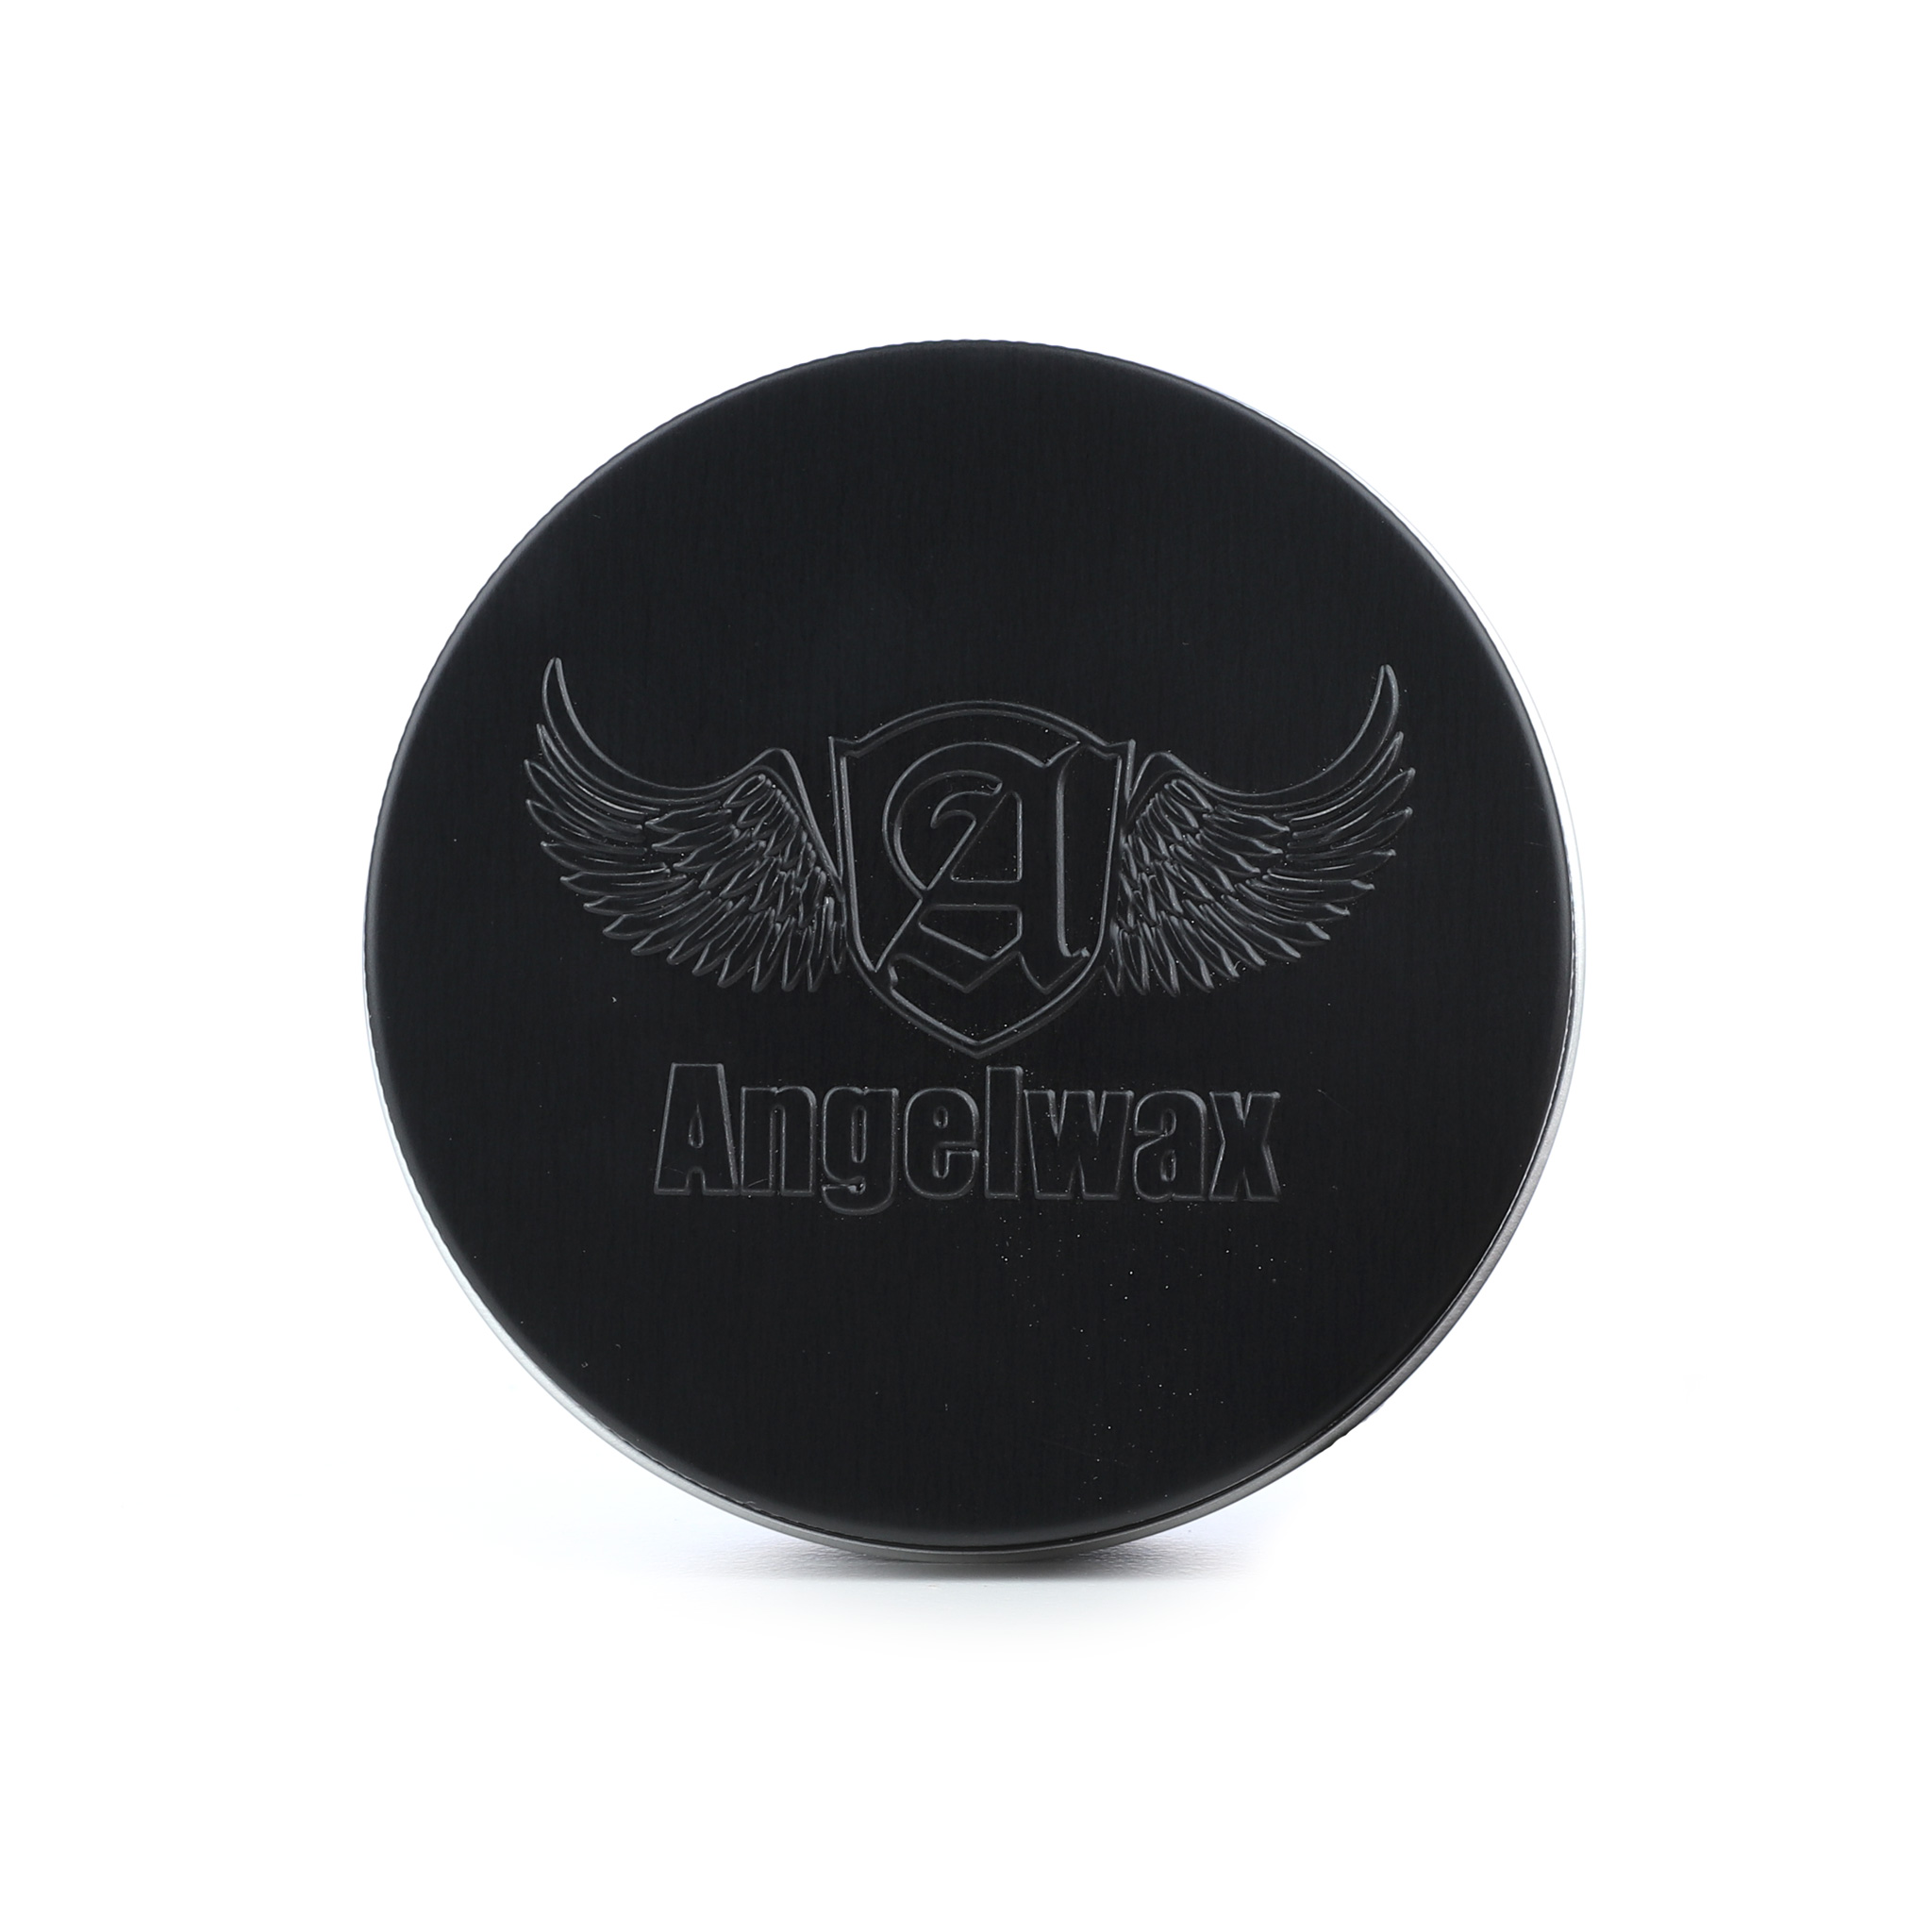 Metallpolermedel Angelwax Alchemy, 150 g